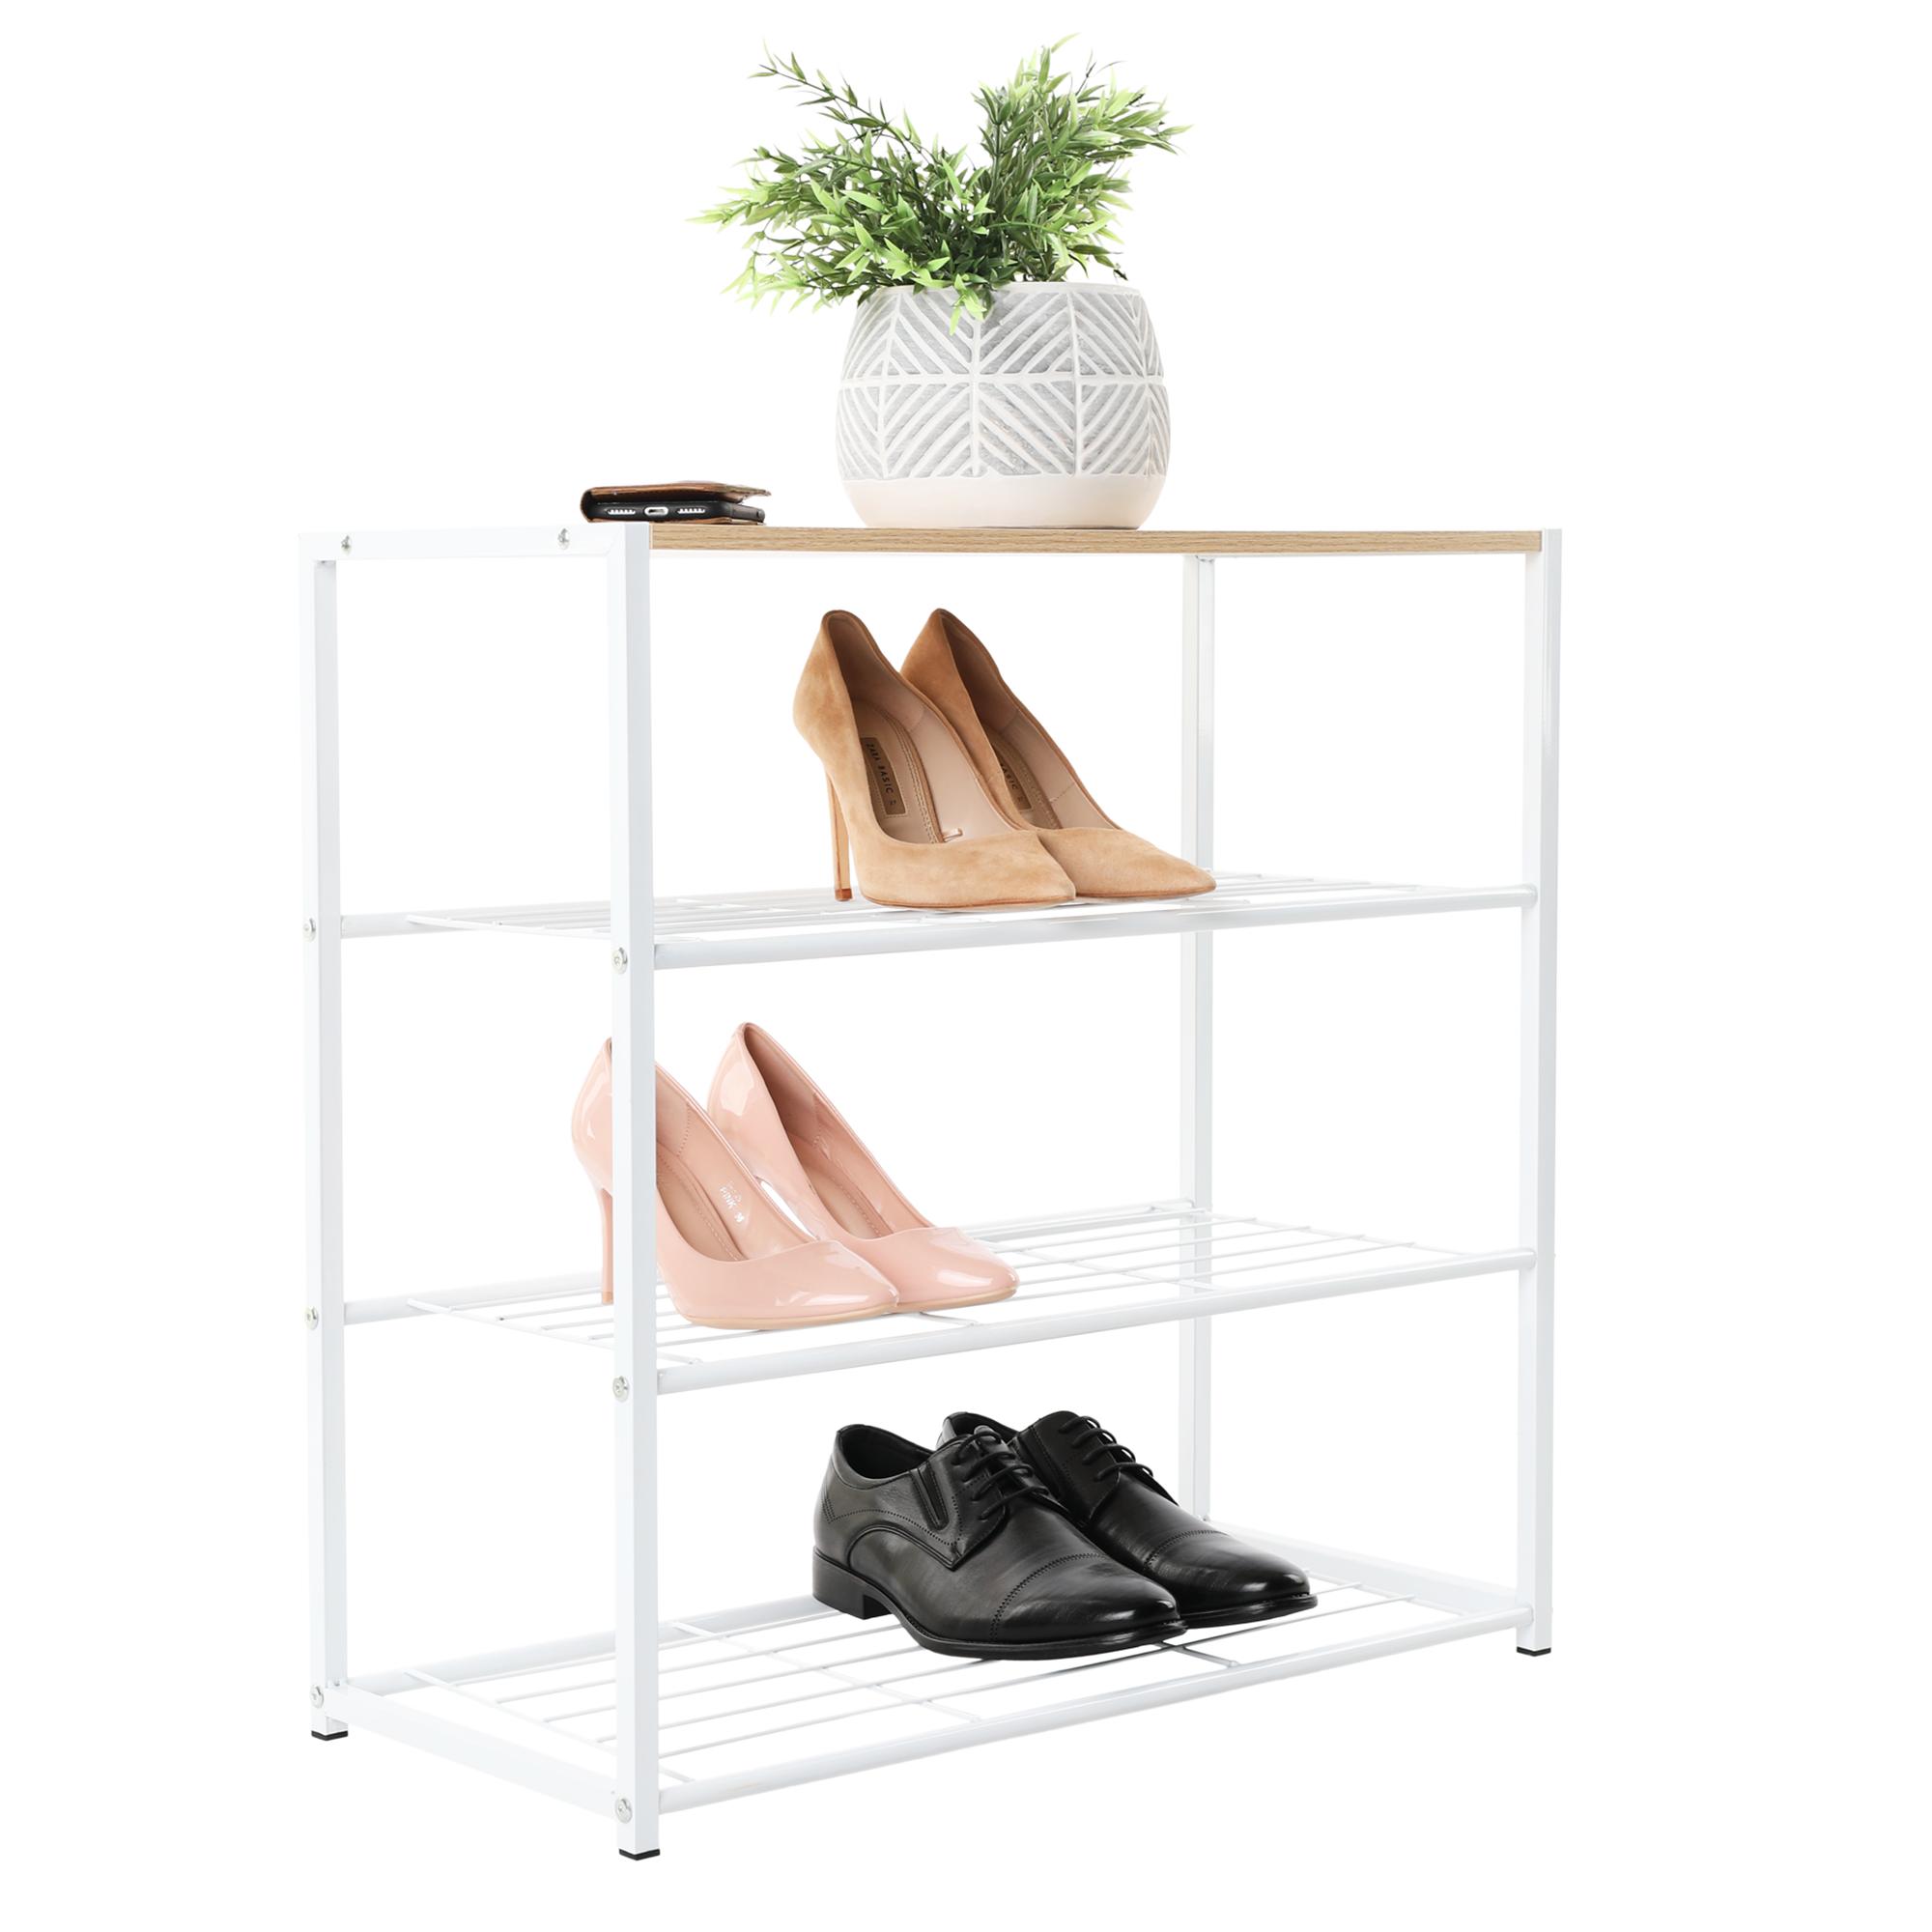 Cutie pentru pantofi, cu 3 rafturi, alb / stejar, LINDEN TIP 1